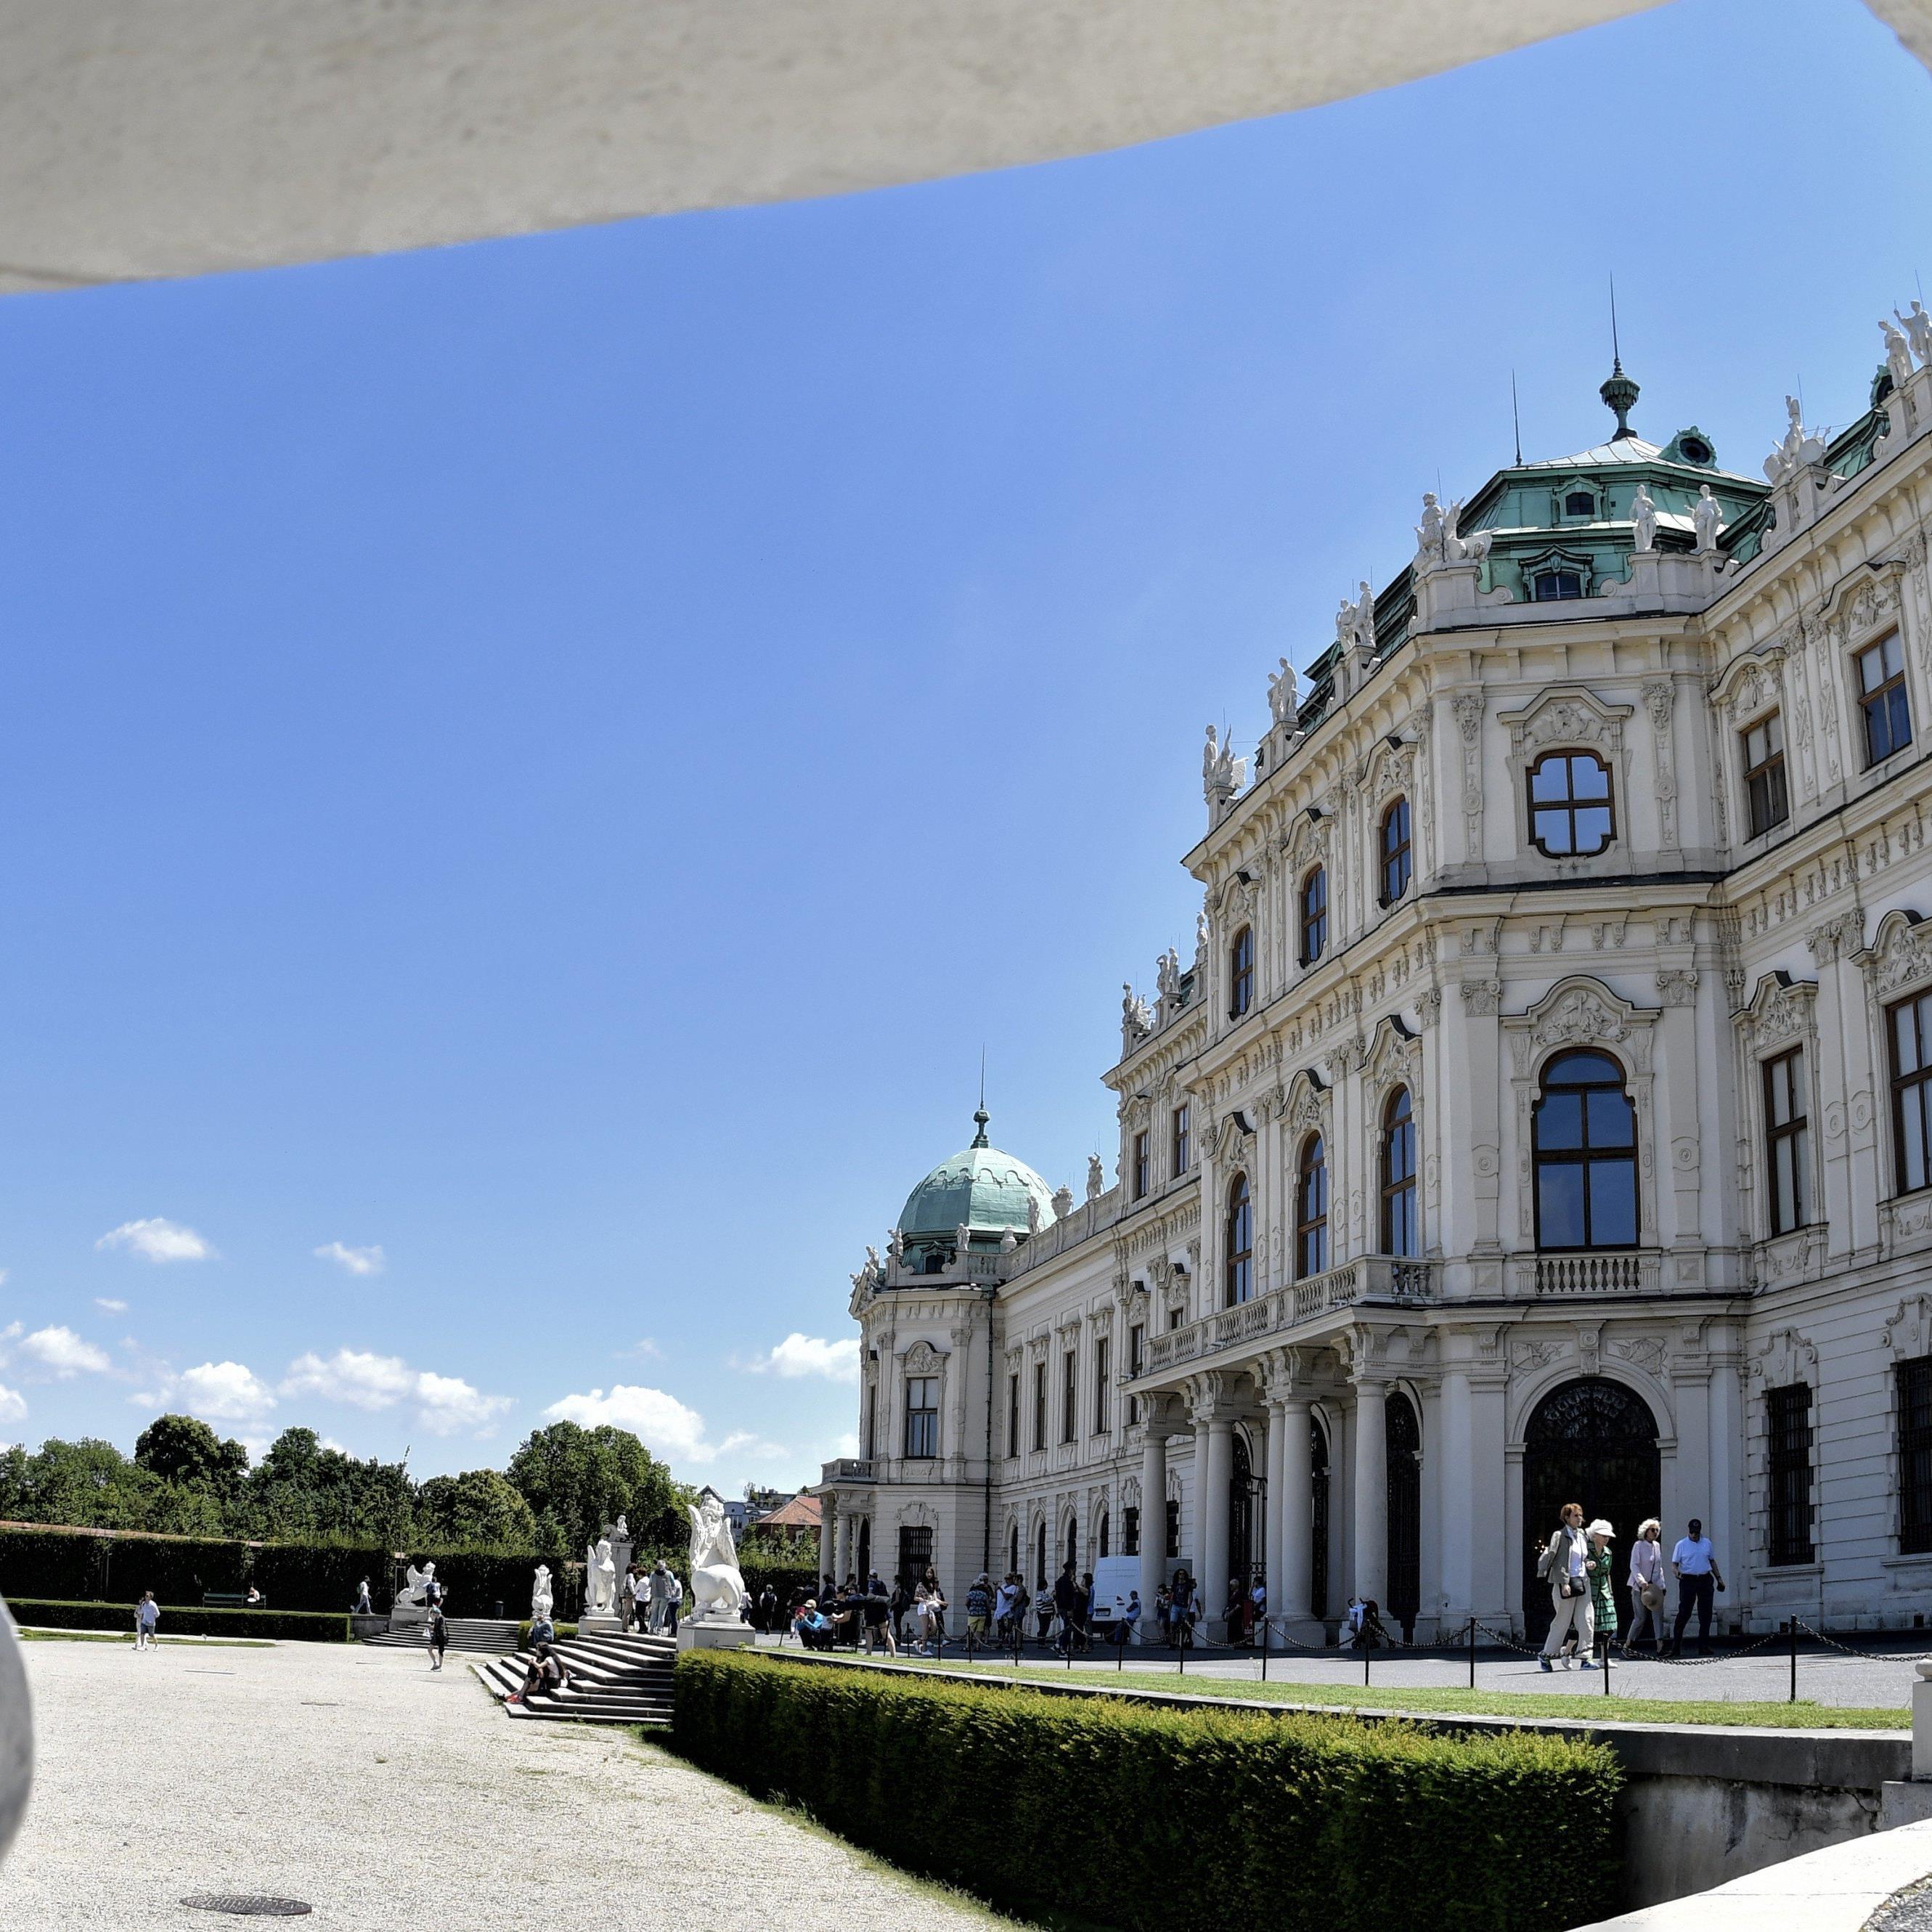 Das Belvedere in Wien.